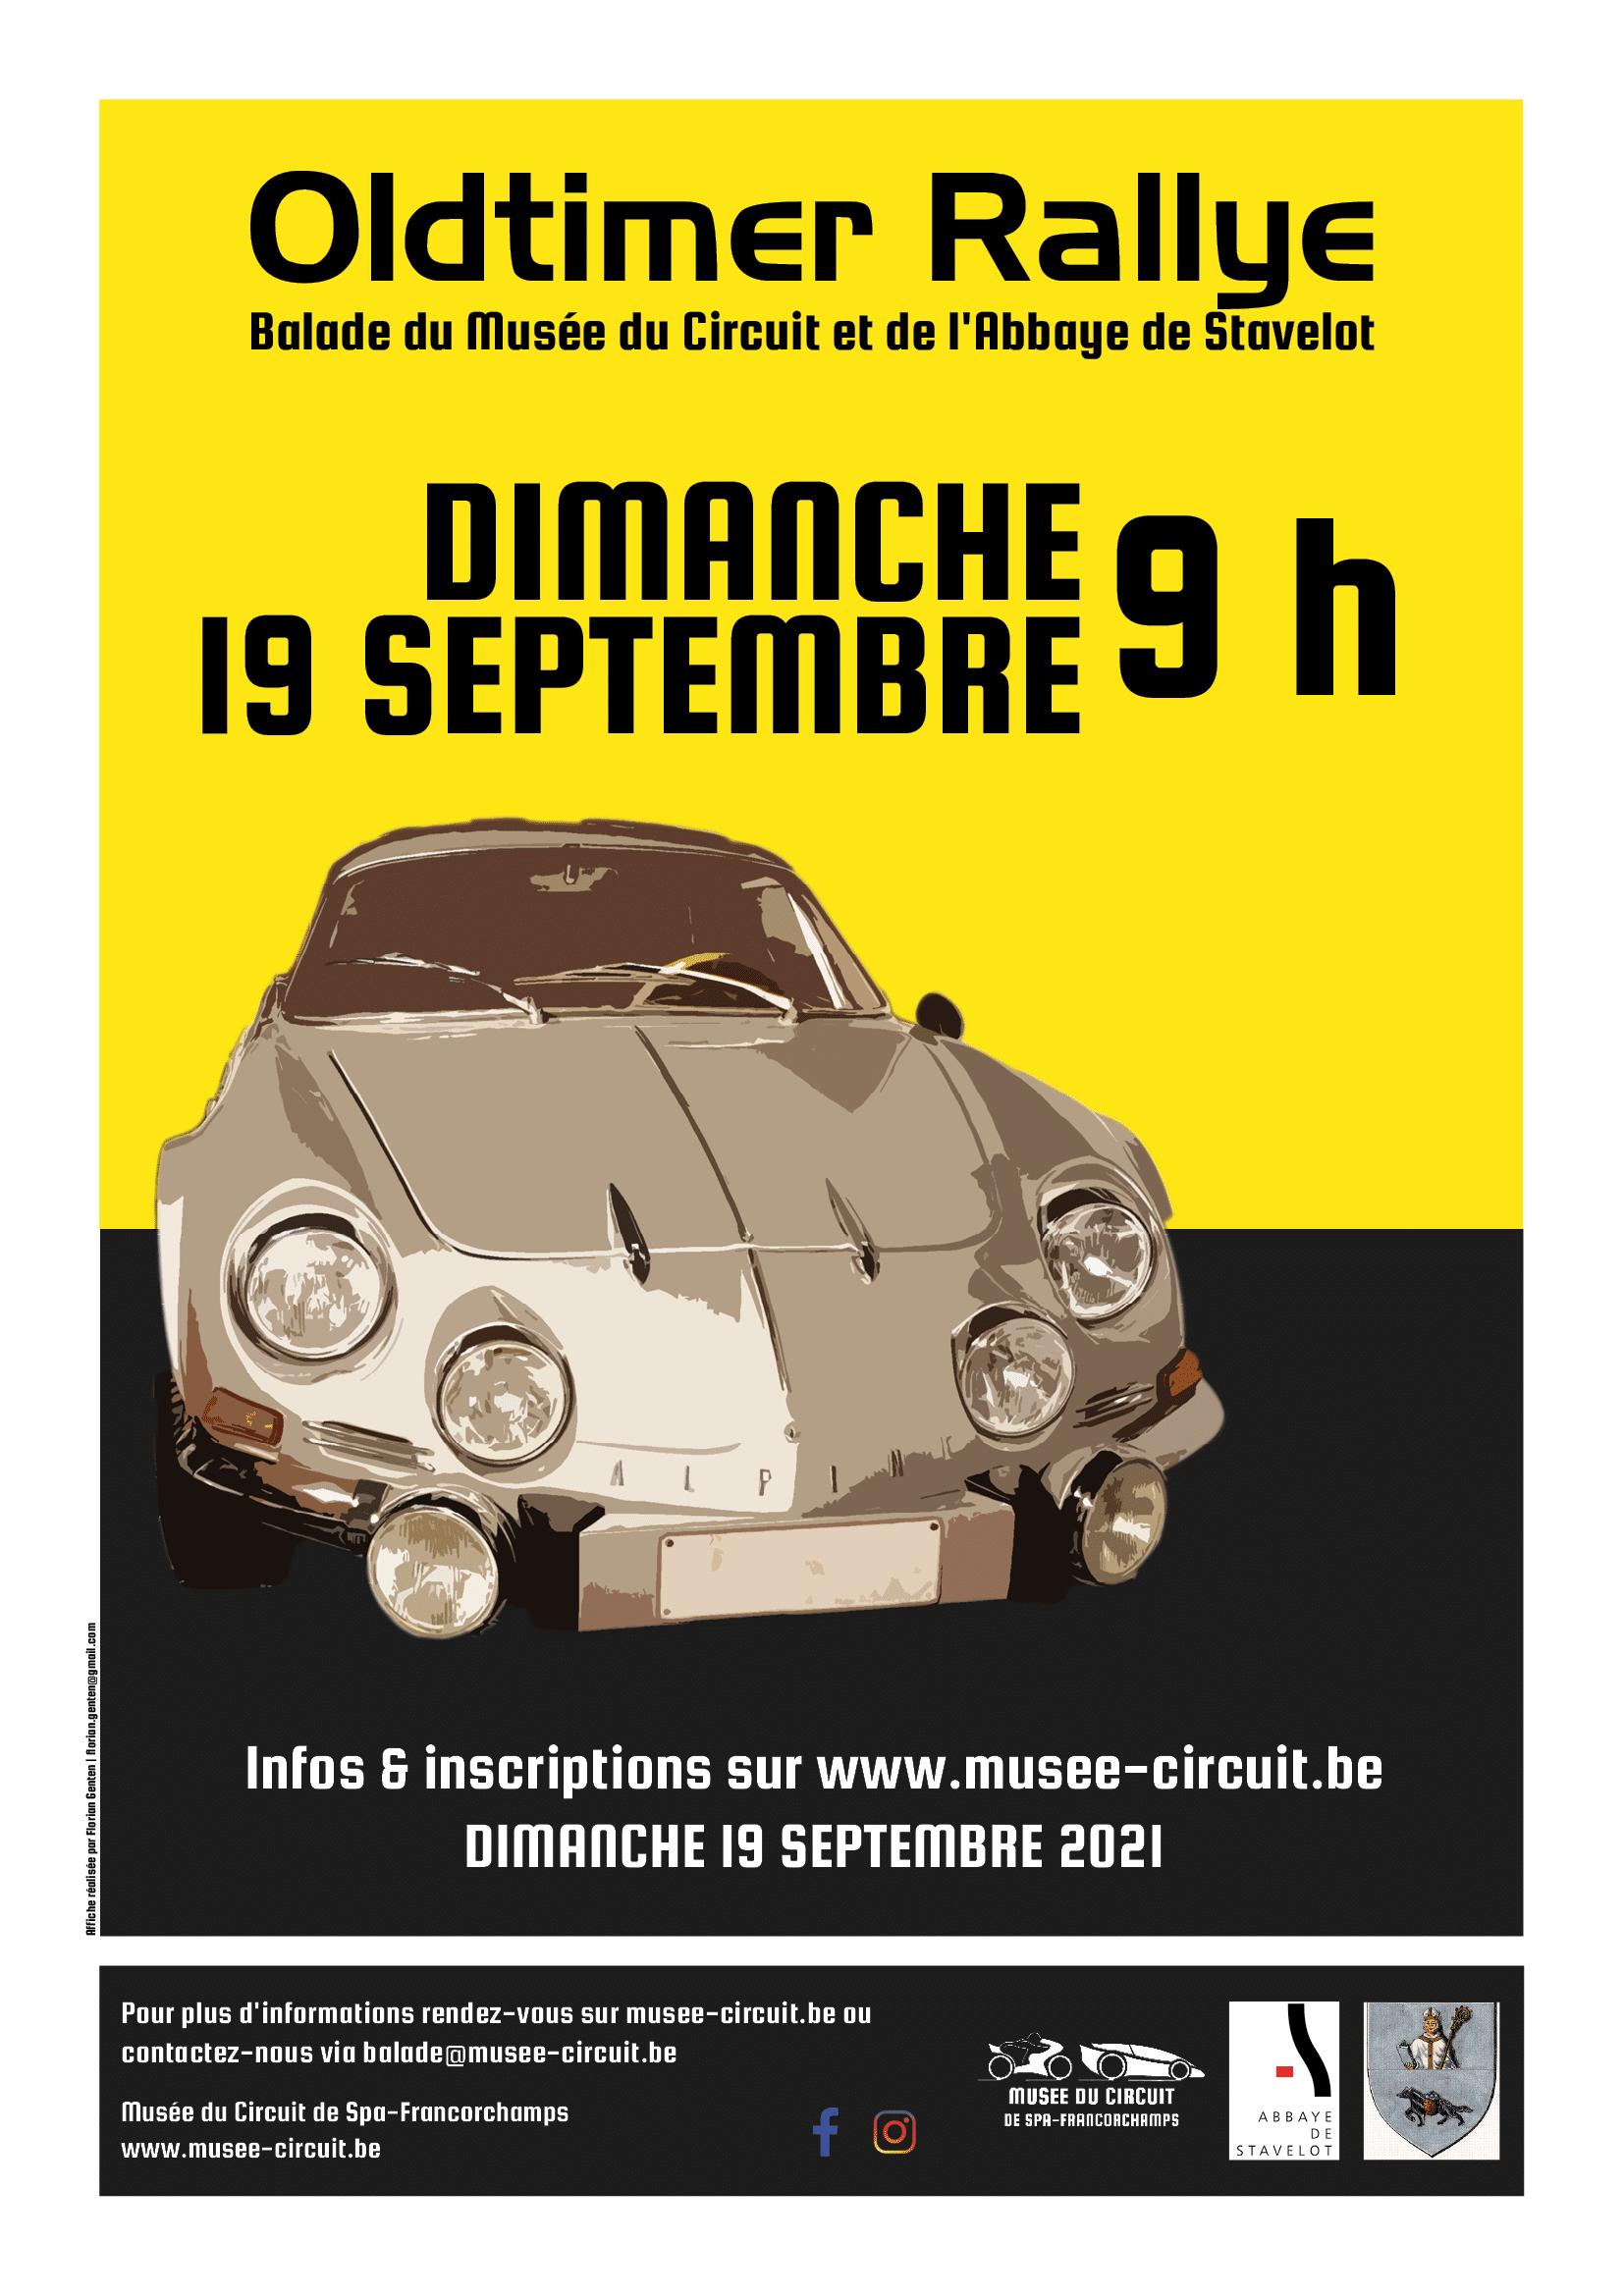 Affiche Balade Oldtimer Musée du Circuit